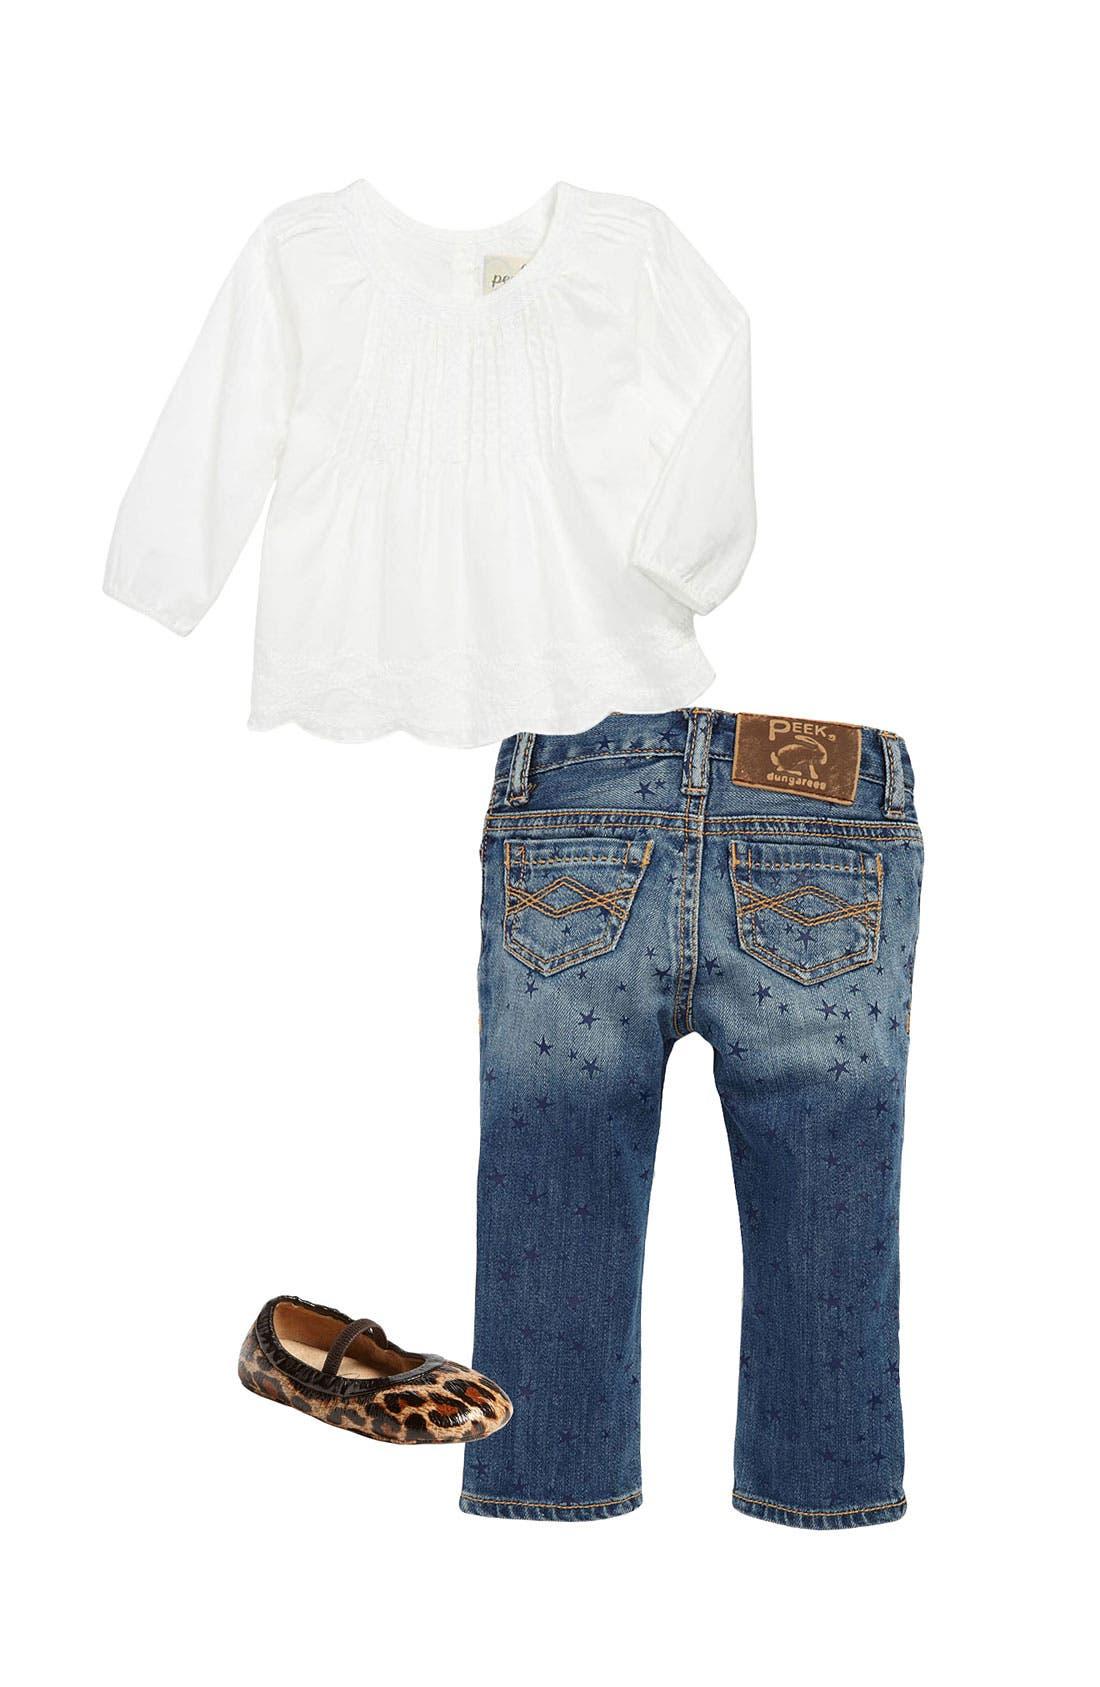 Main Image - Peek Top, Skinny Jeans & Crib Shoe (Infant)